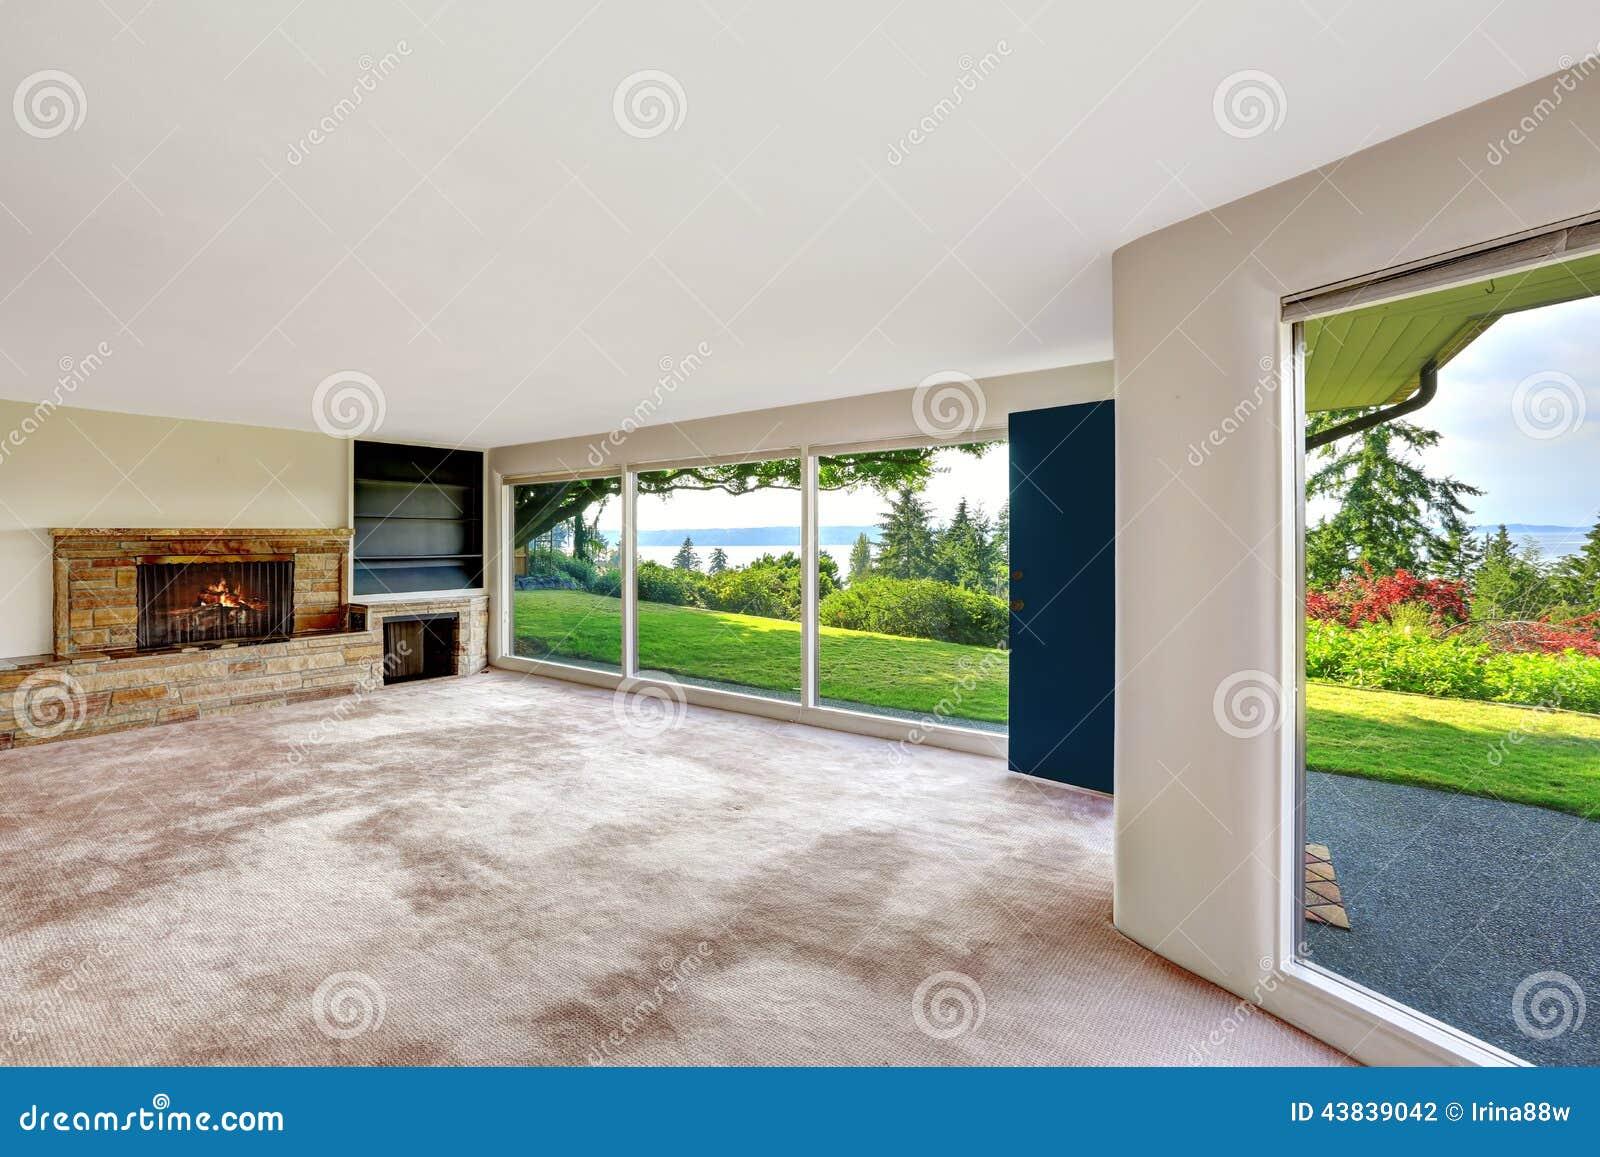 basement windows interior. Spacious Empty Living Room With Walkout Basement Overlooking Bea. House, Glass. Windows Interior